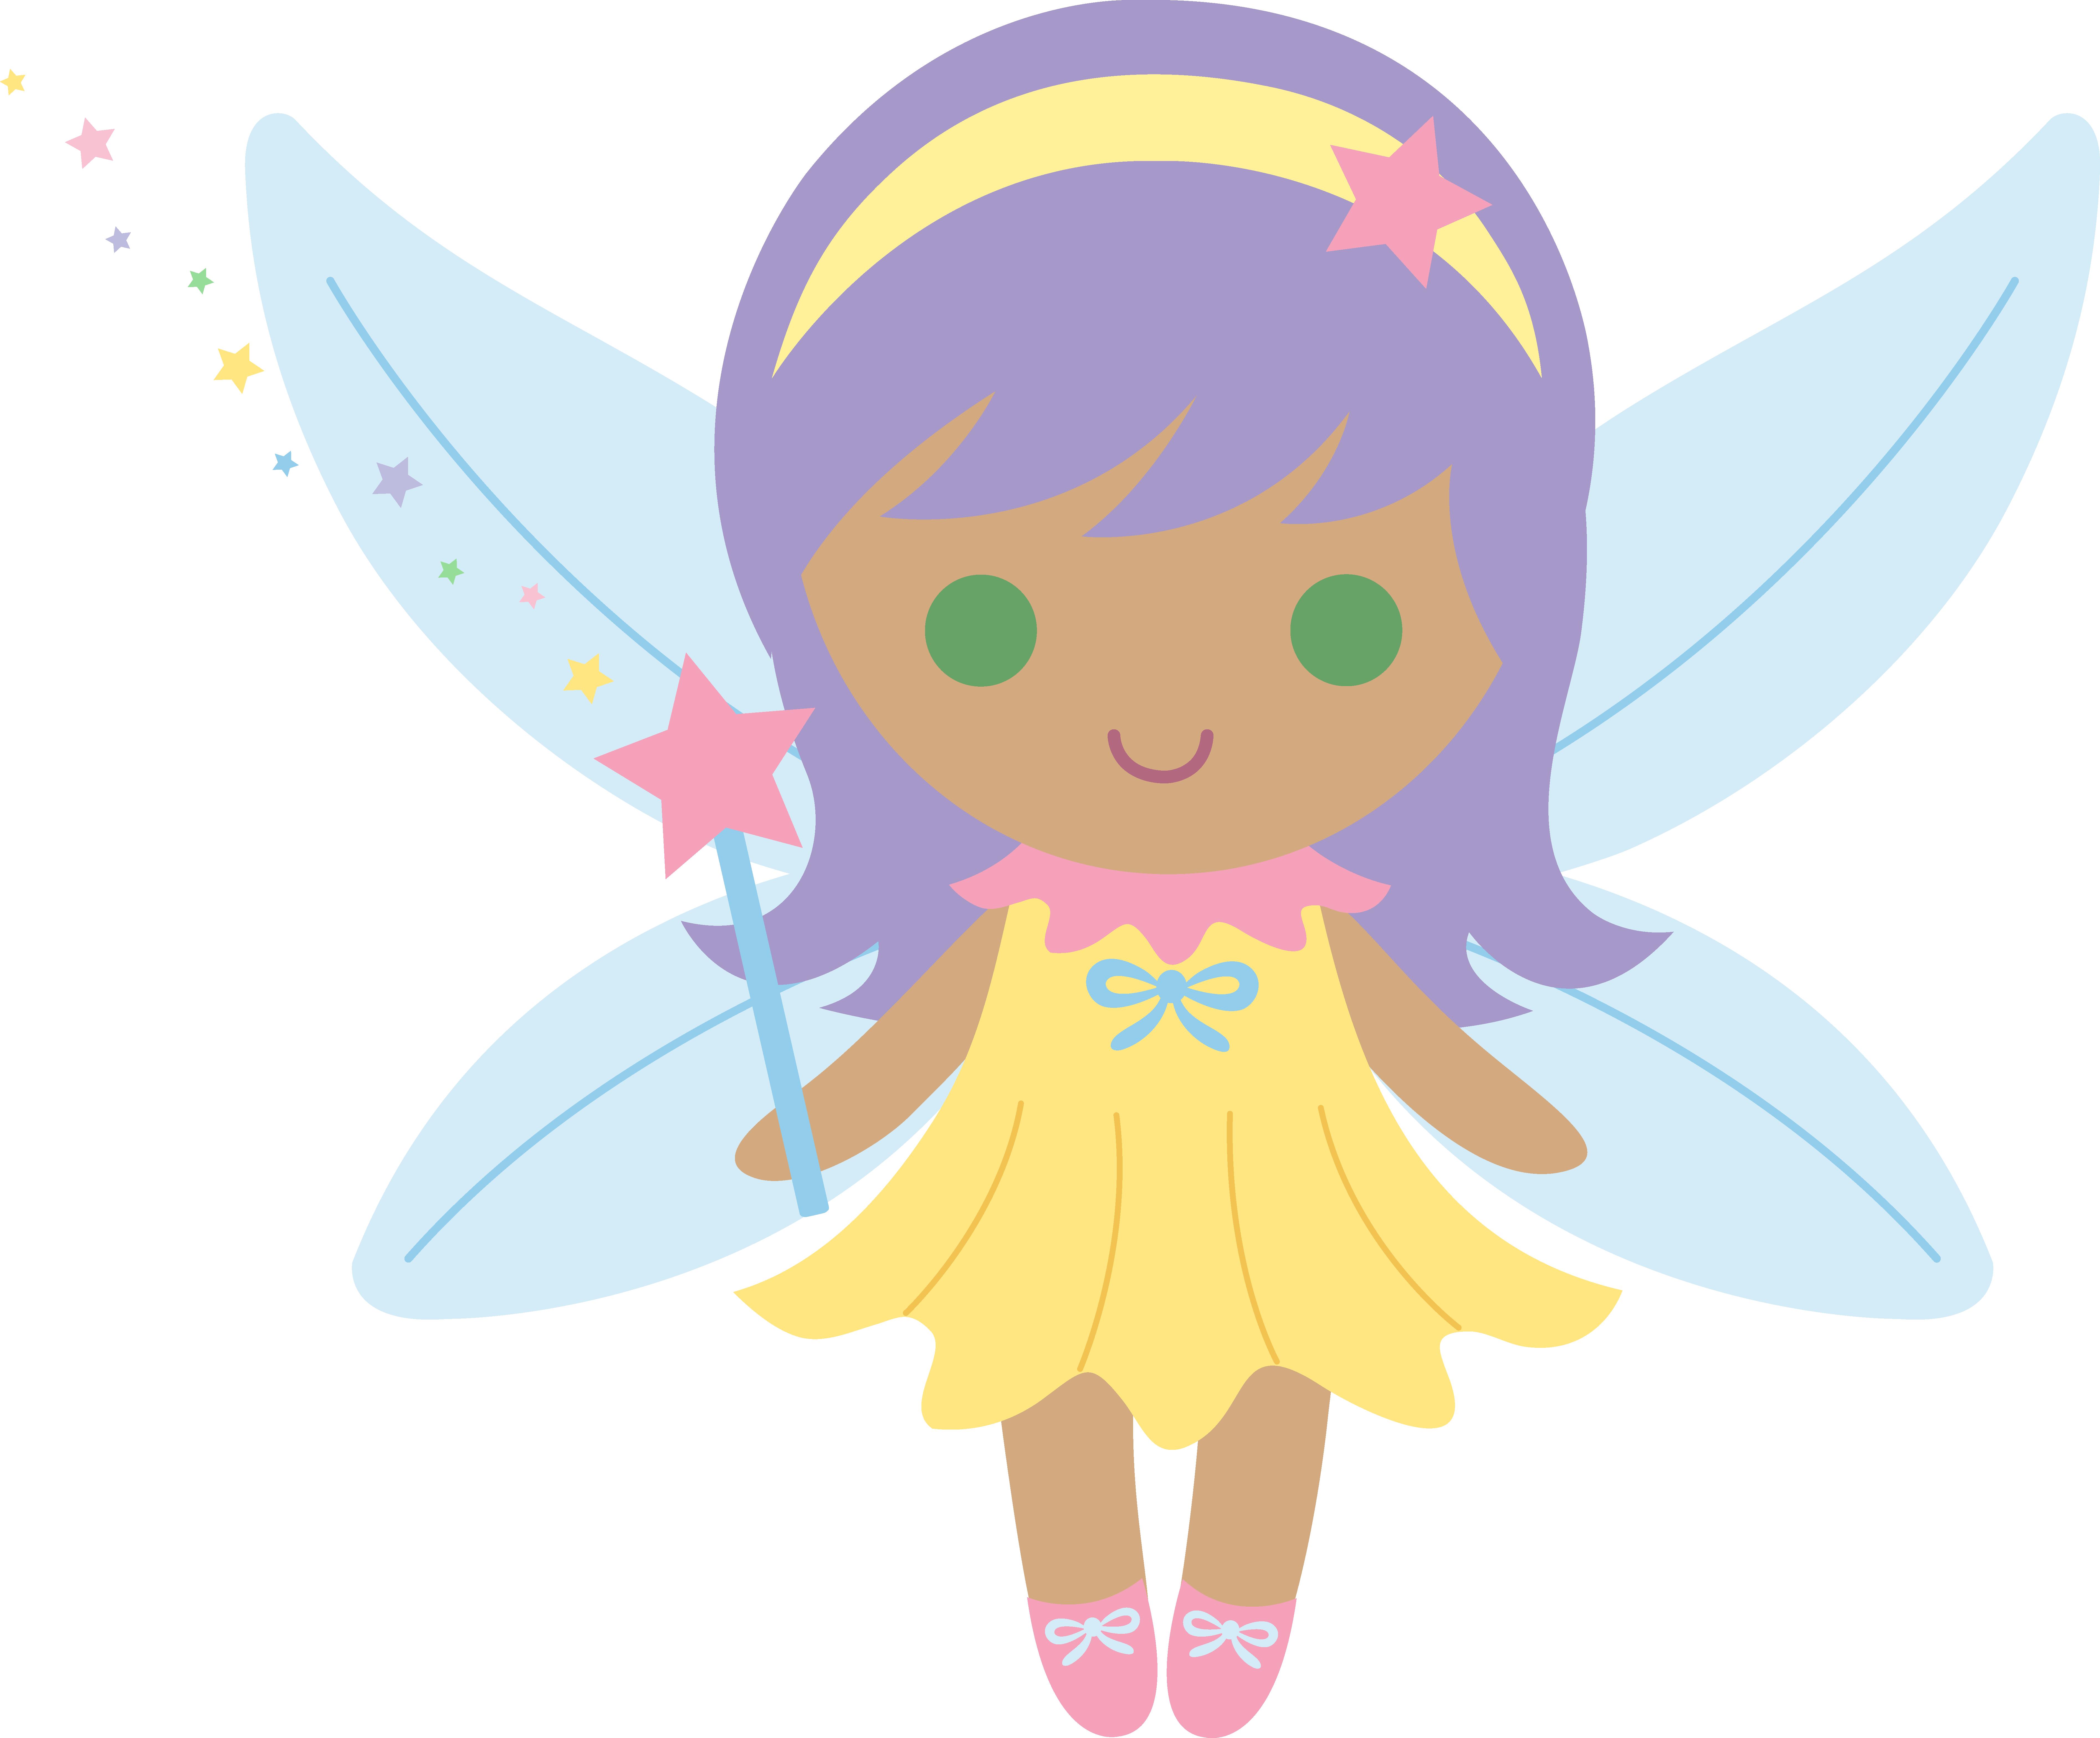 Fairy free download best. Mushroom clipart tinkerbell